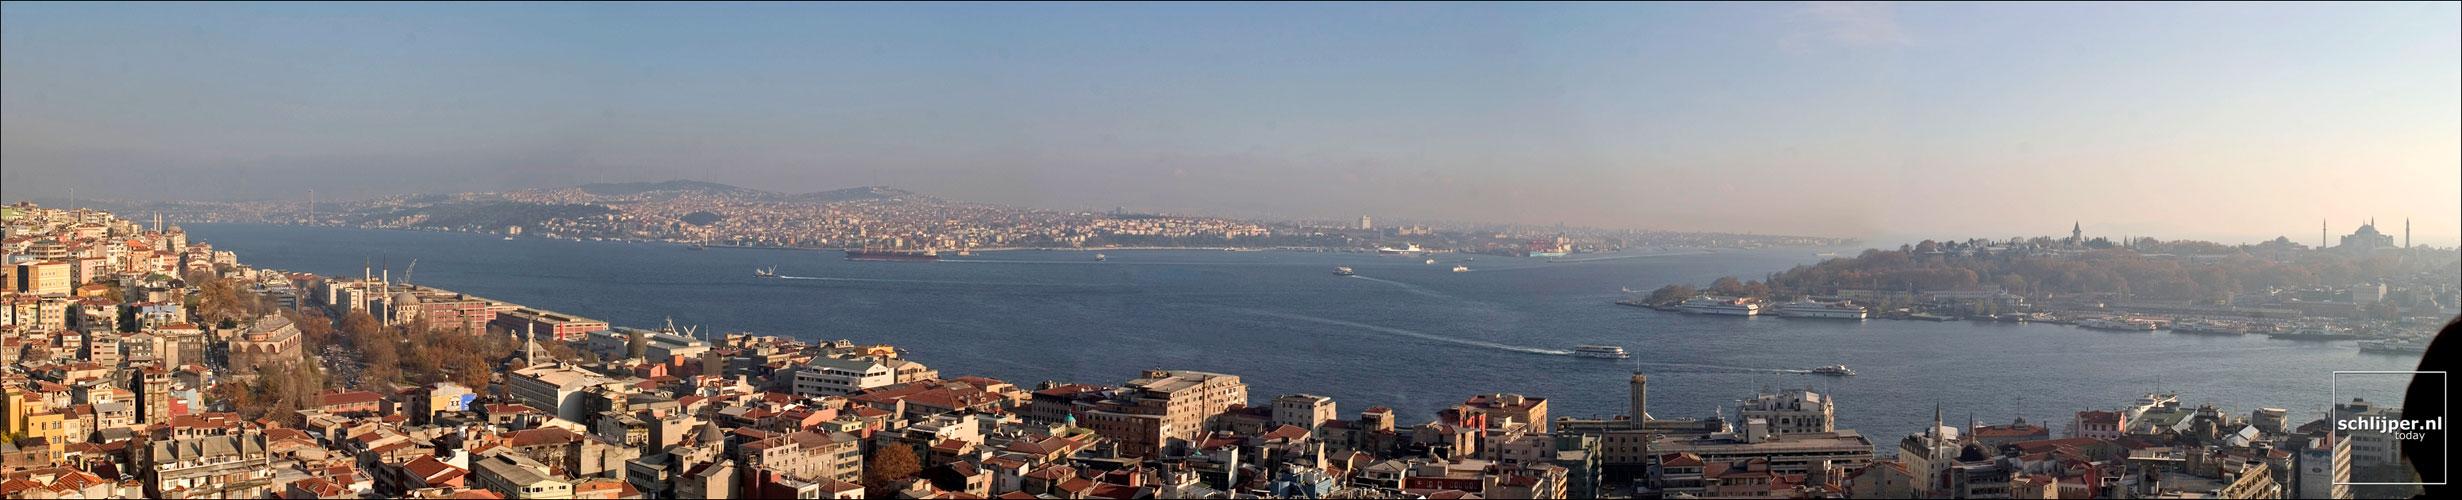 Turkije, Istanbul, 6 december 2004